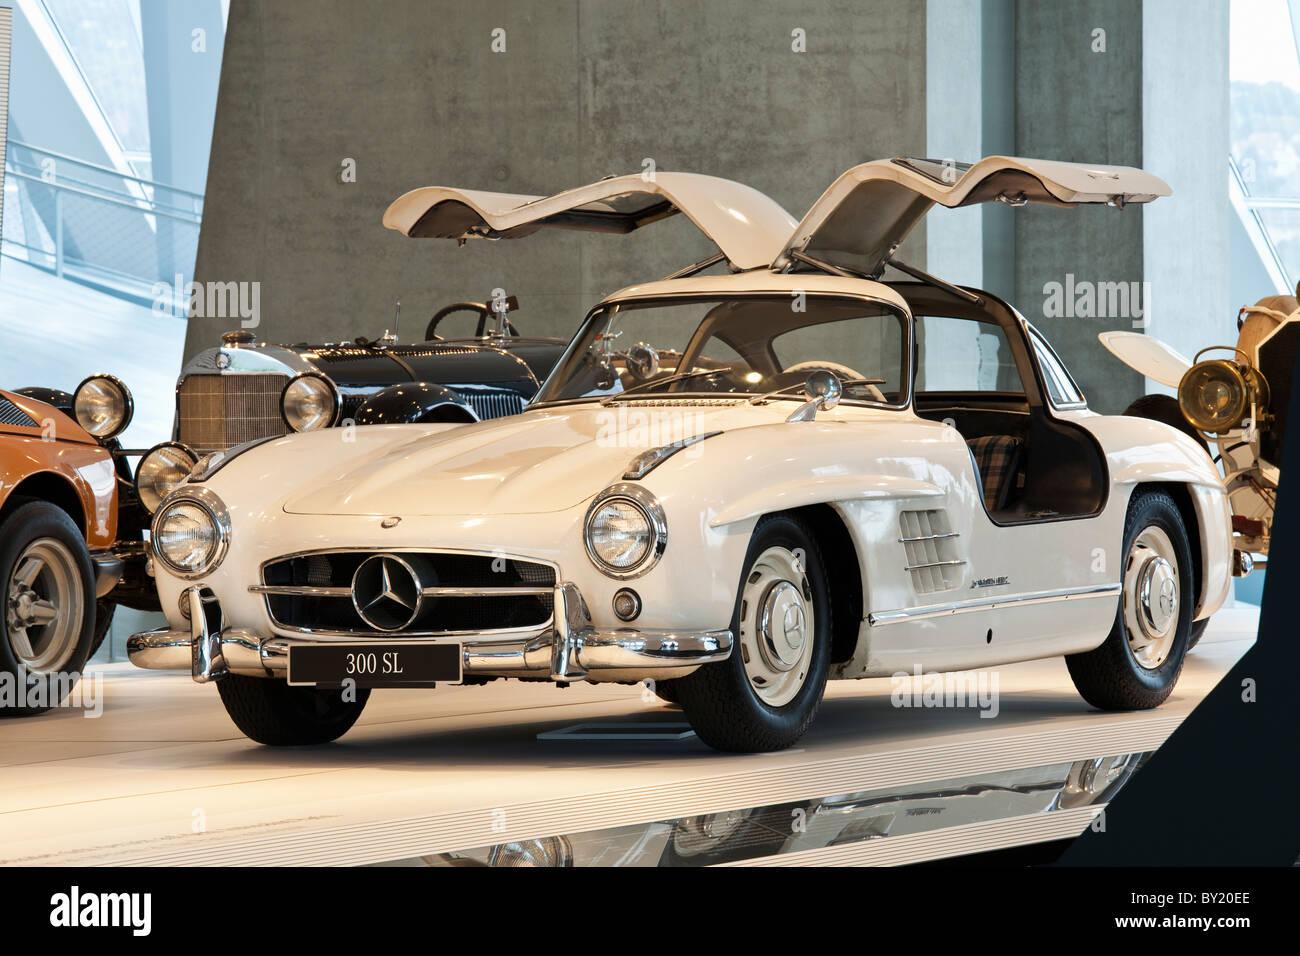 Mercedes Stock Photos Images Alamy Benz 230ce Fuel Filter Germanystuttgart Museum Merecedes 300 Sl Series